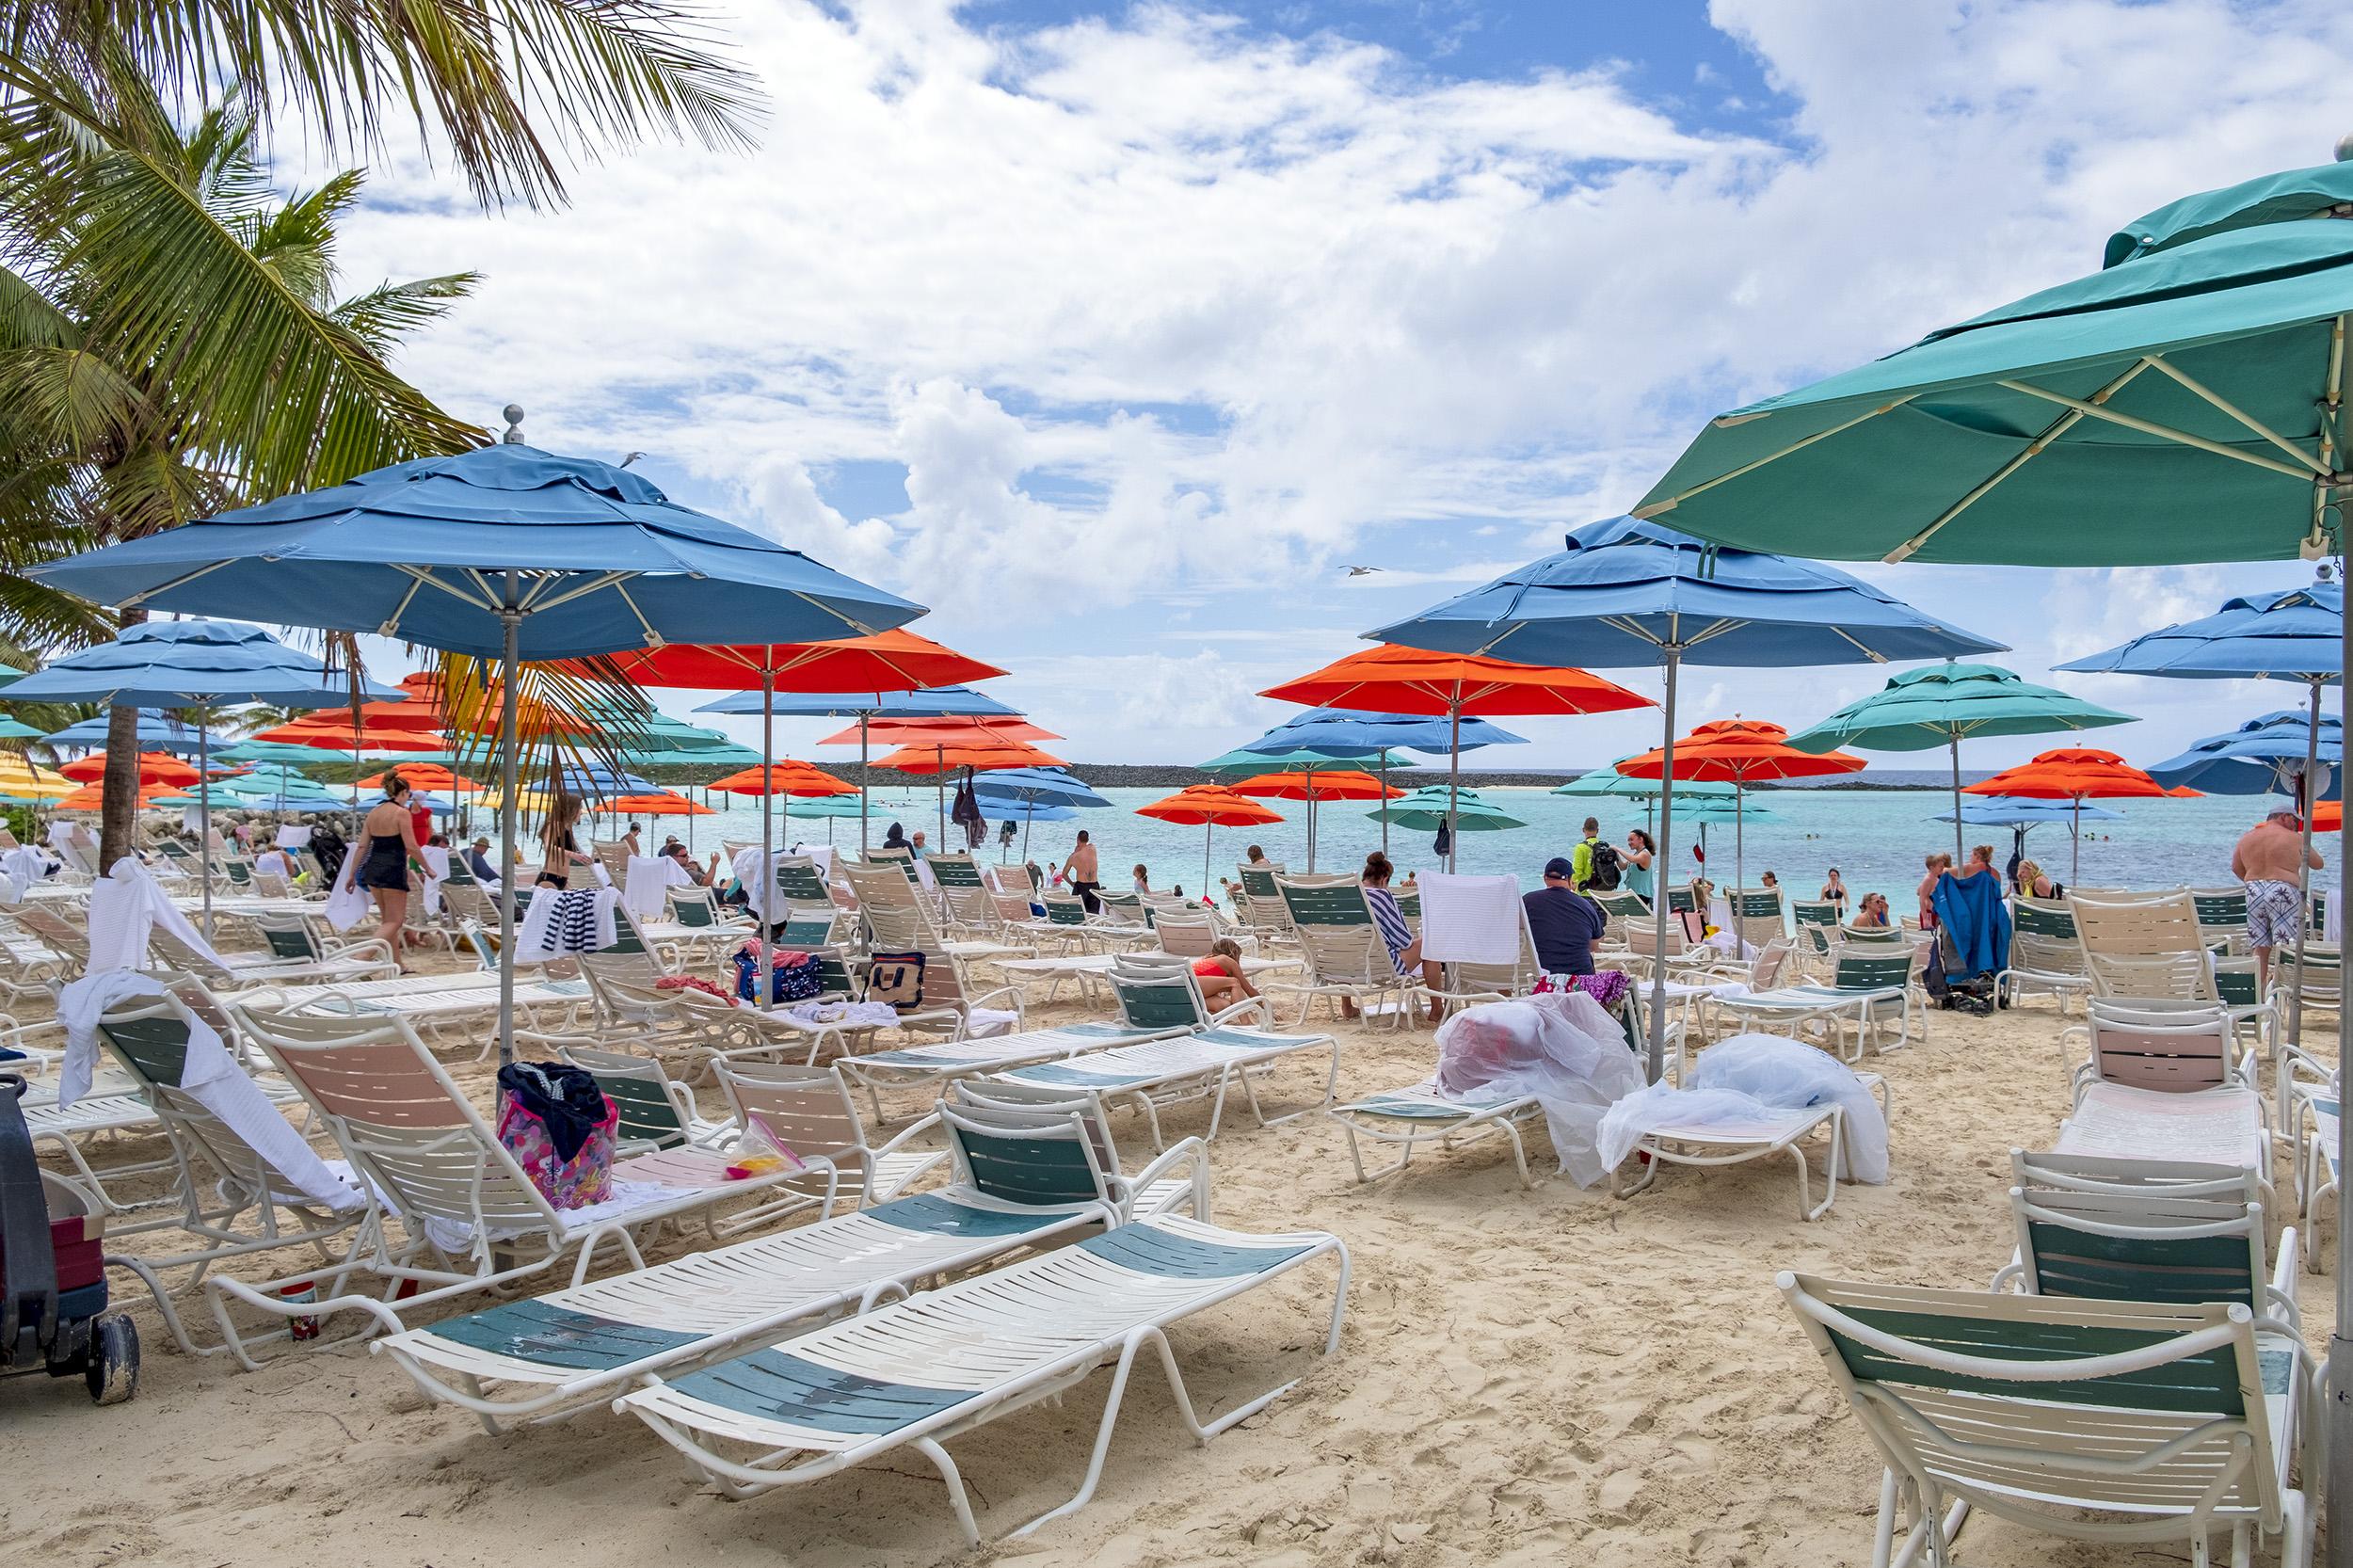 Castaway Cay beach